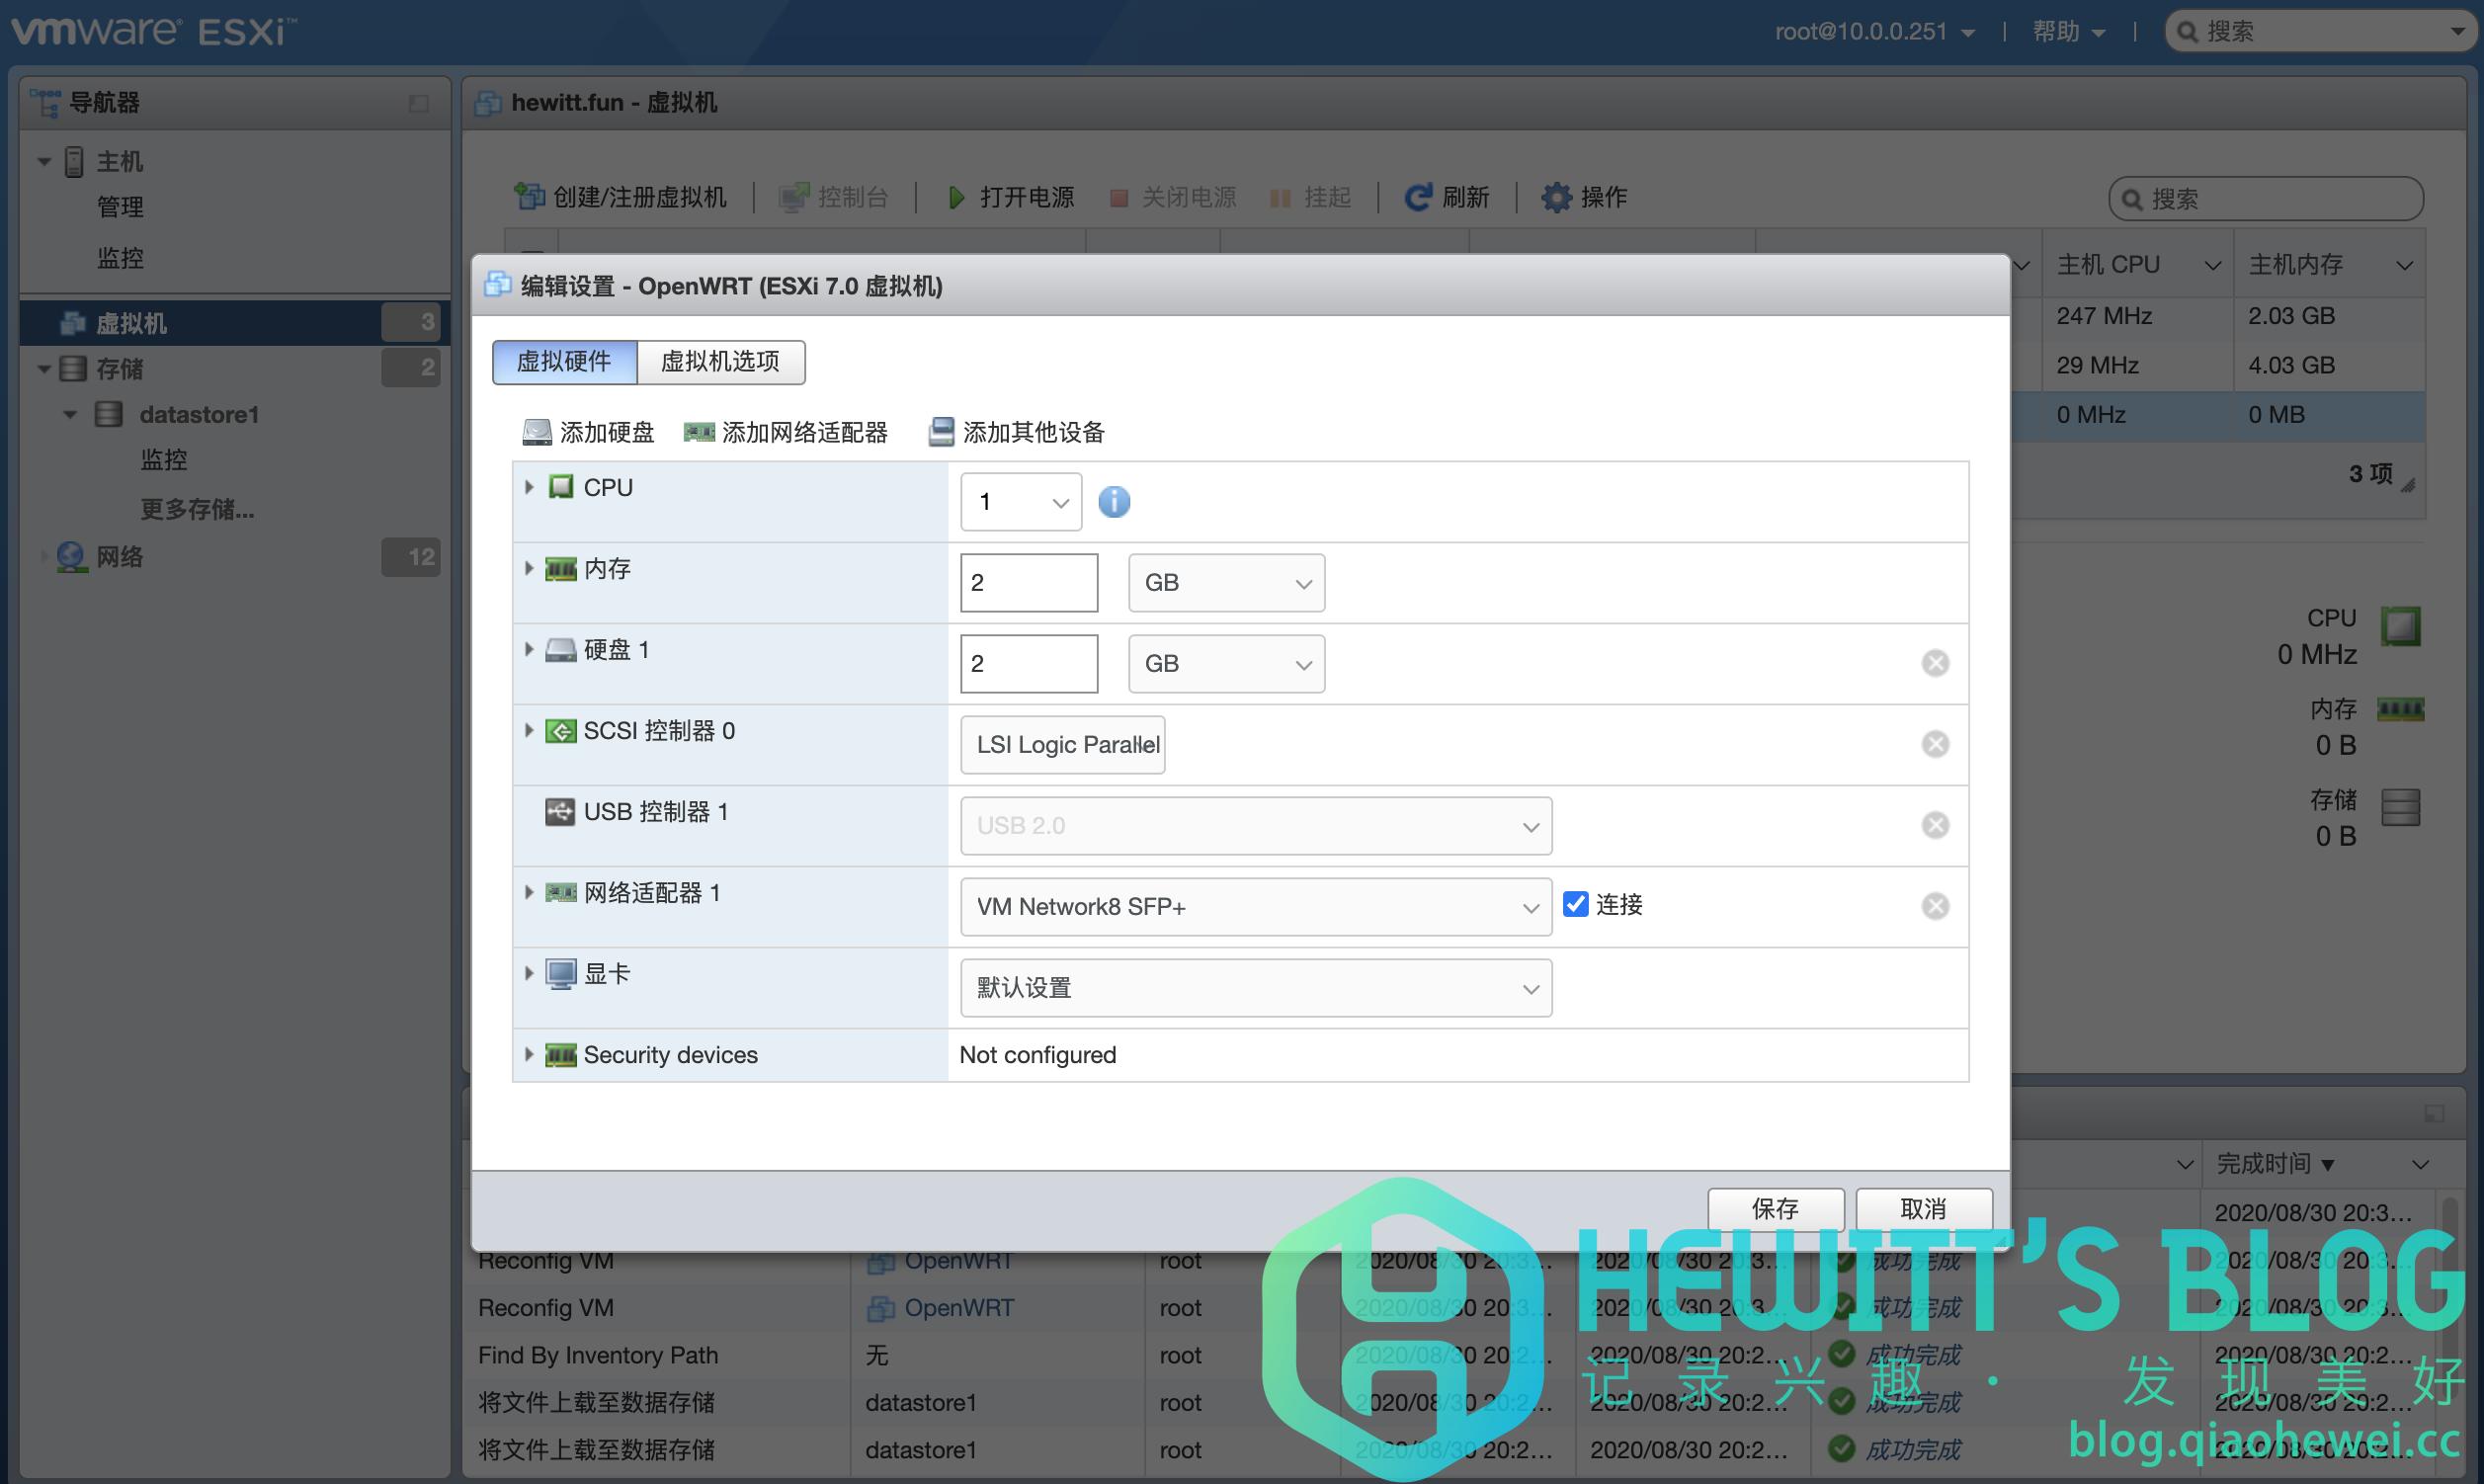 ESXI安装OpenWRT & LEDE软路由部署指南(附镜像下载)插图19